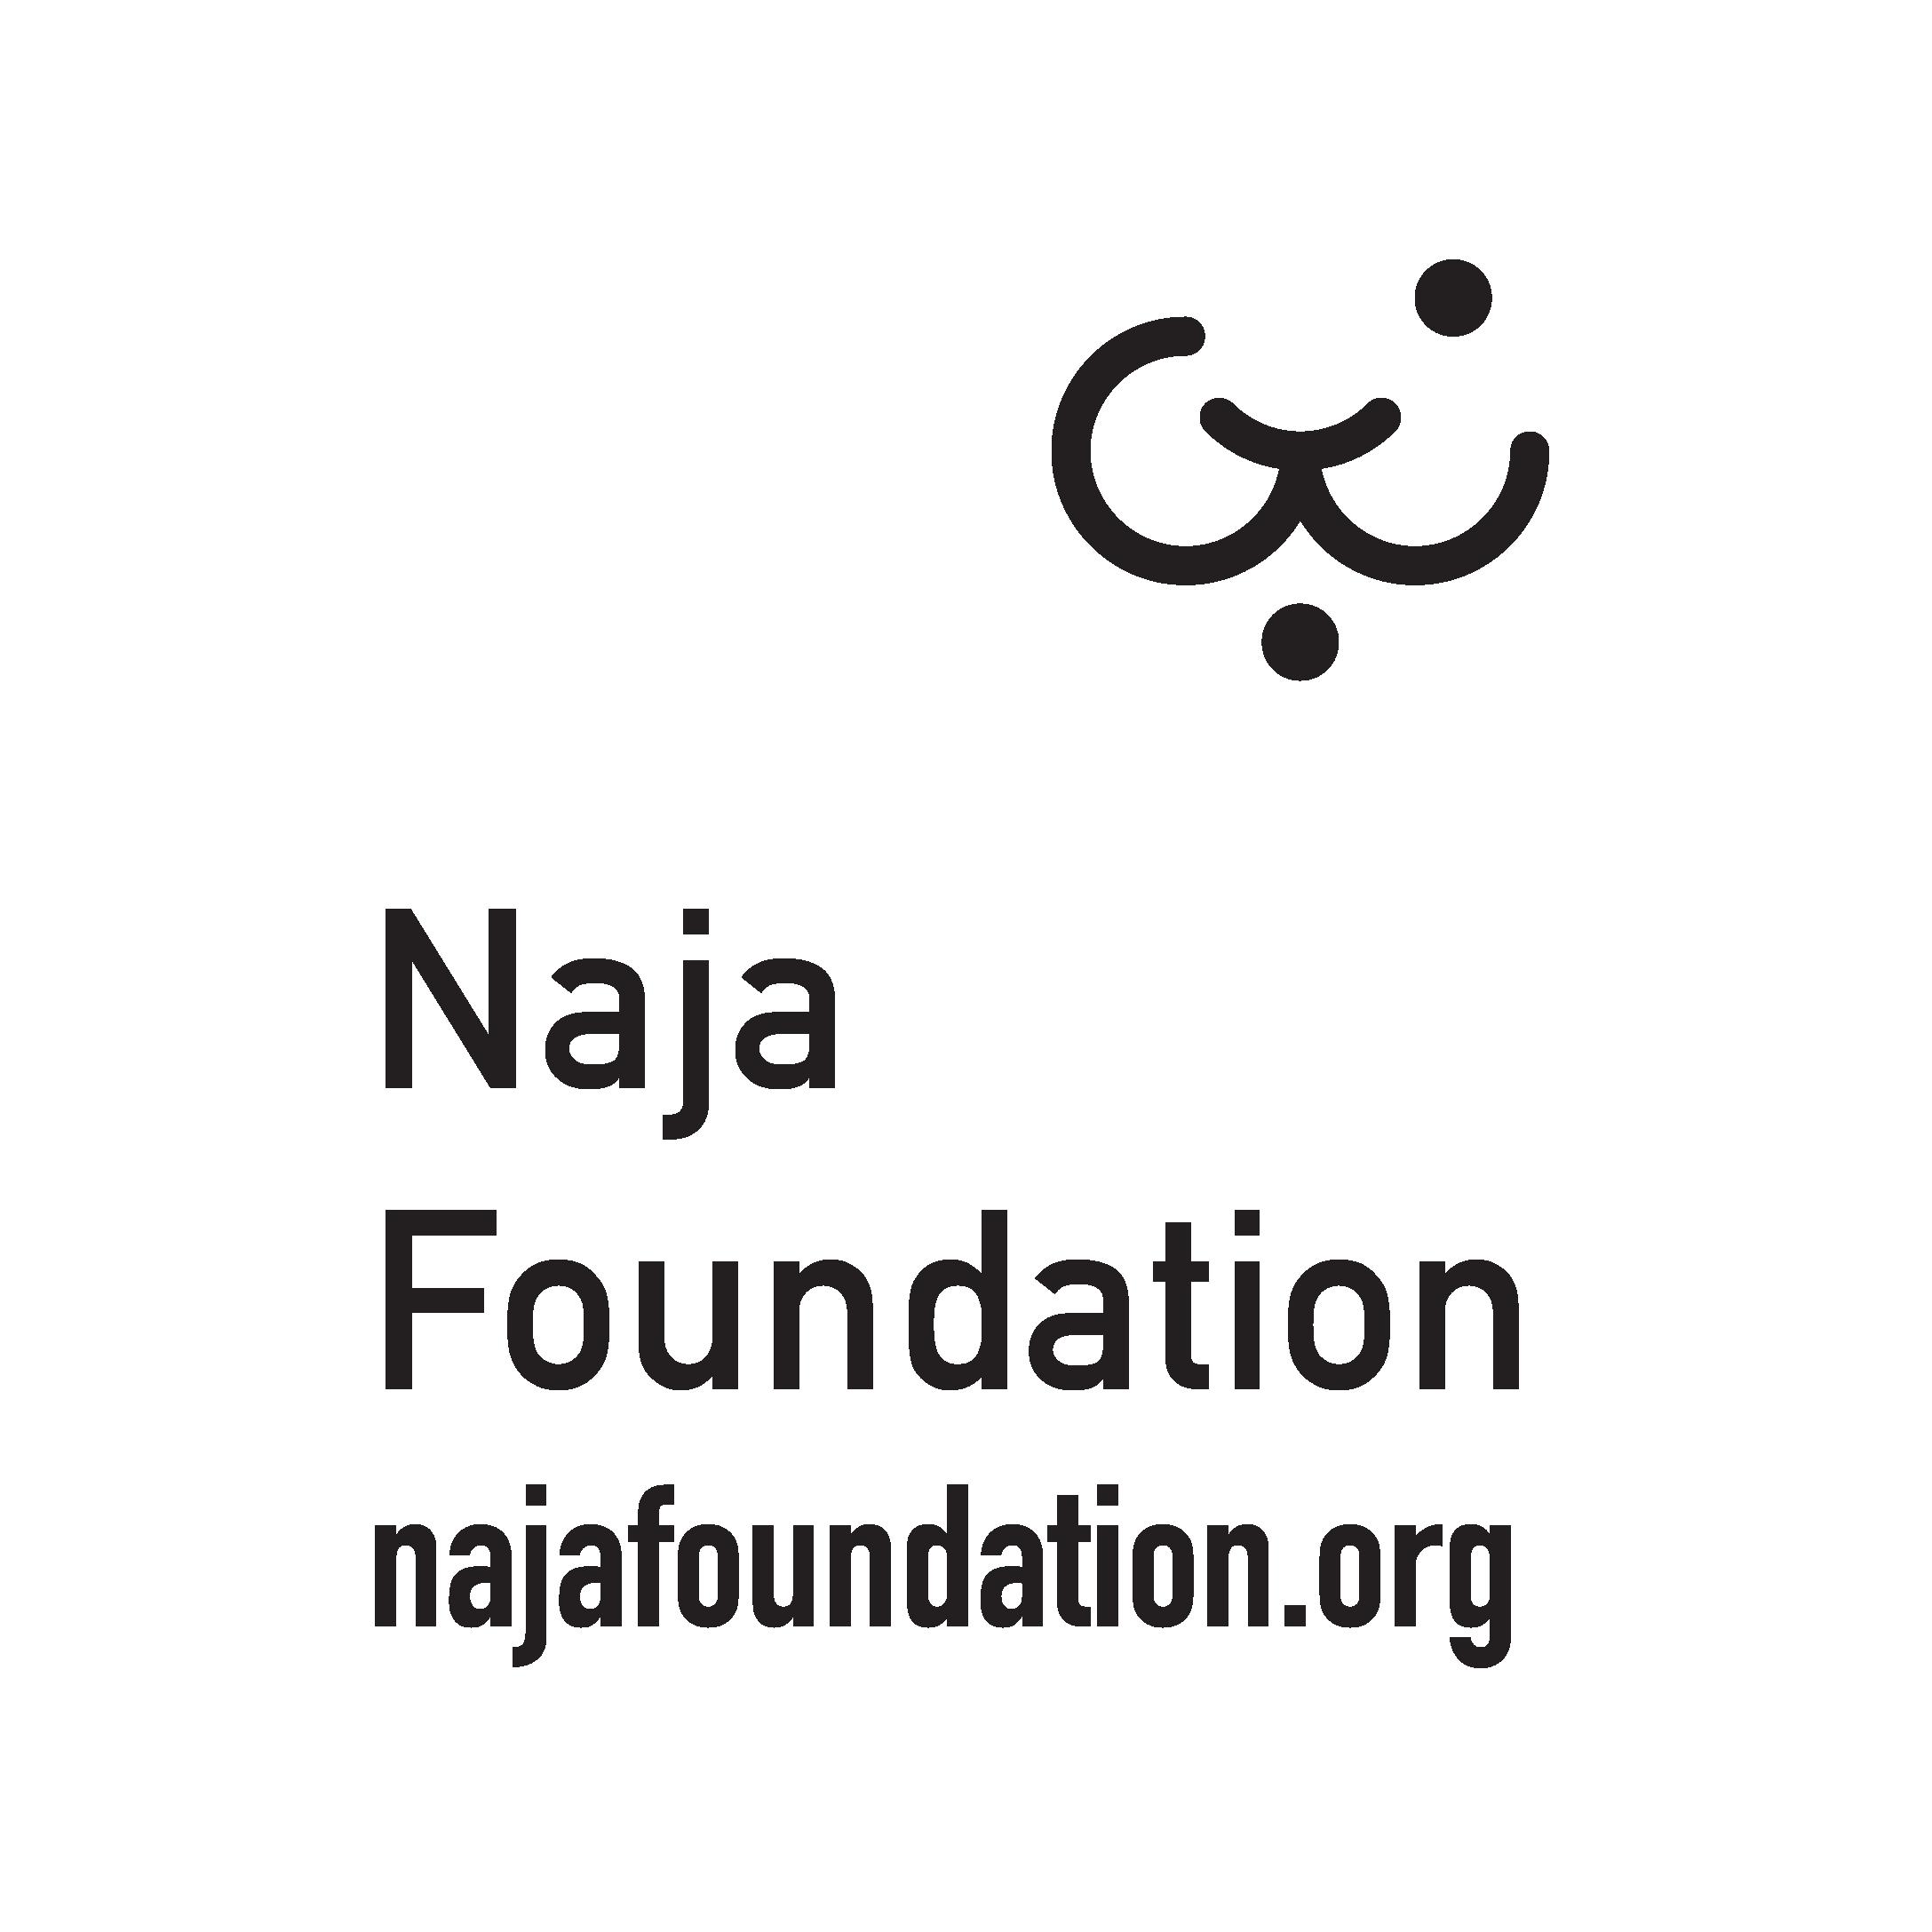 Naja Foundation